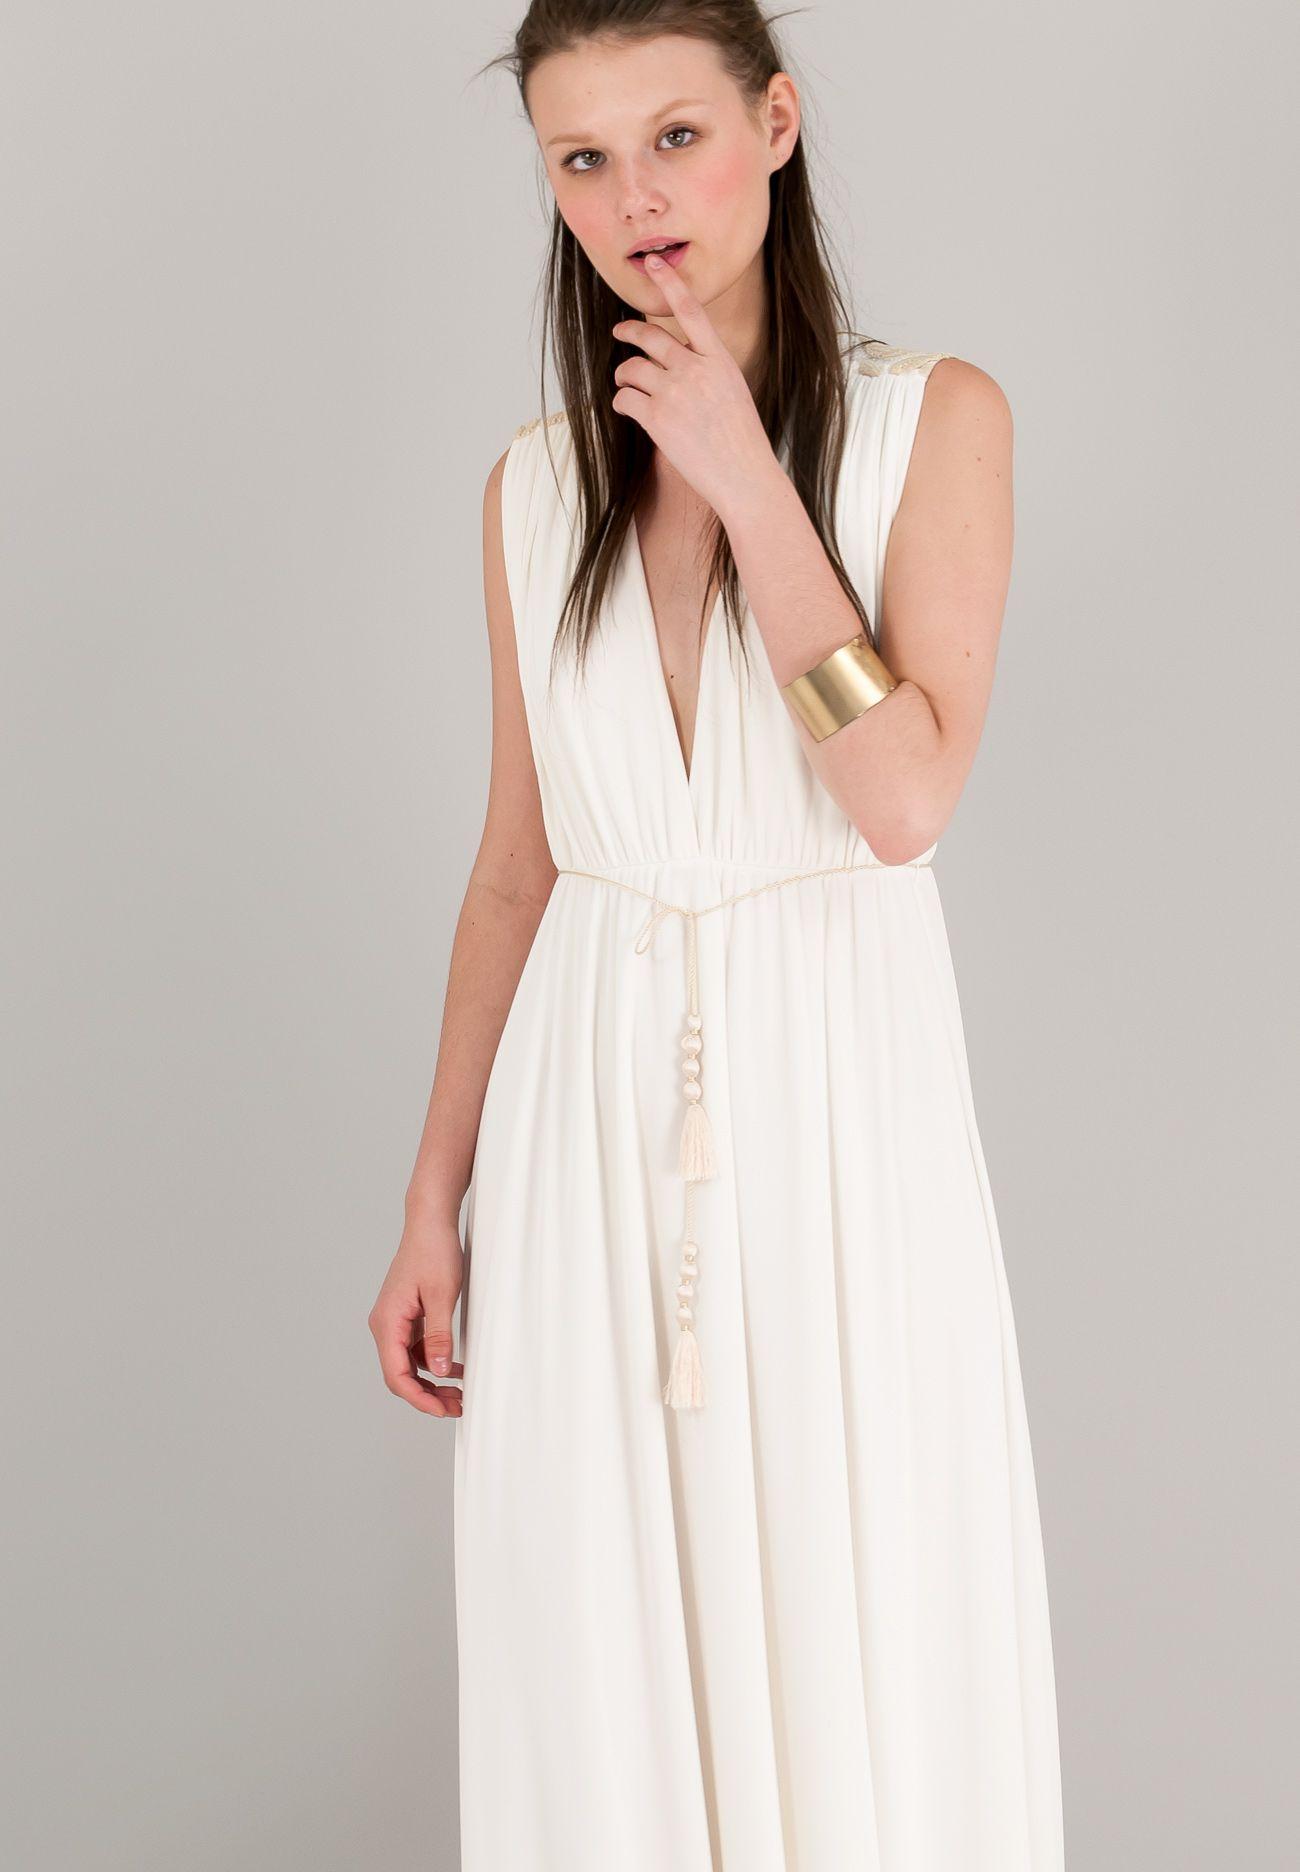 828337b86197 Μακρύ φόρεμα σε αρχαιοελληνικό στιλ με βαθύ ντεκολτέ και ανάγλυφο  δαντελένιο μοτίβο στη πλάτη.